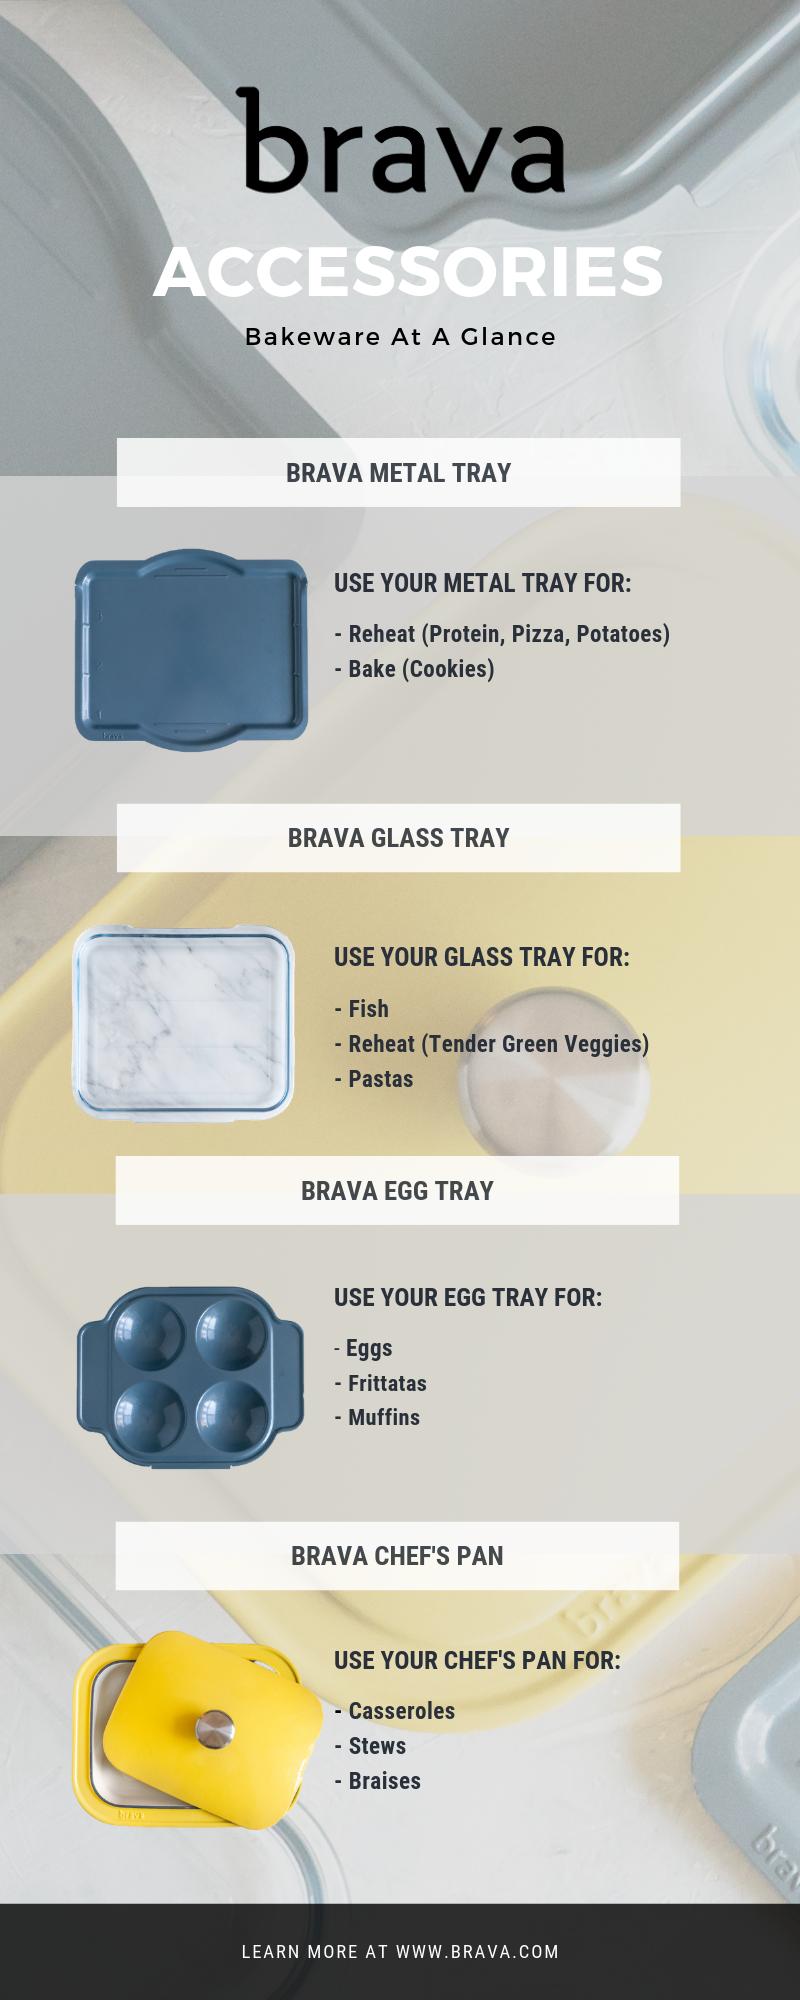 Brava Accessories Oven Recipes Metal Trays Green Veggies